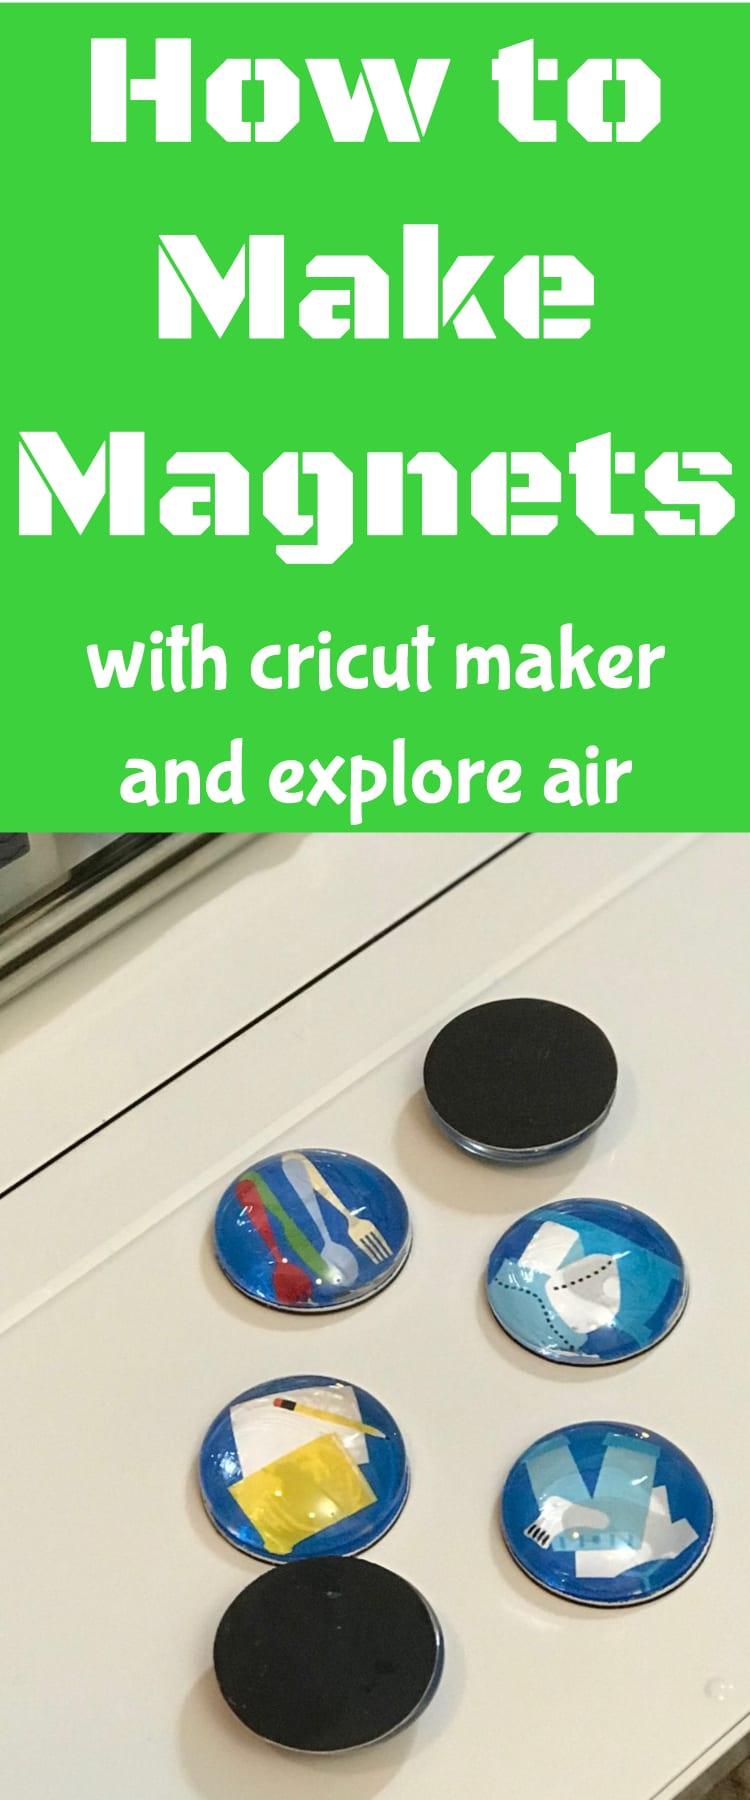 how to make magnets / cricut explore air / cricut maker / diy project / magnet #cricut #cricutmaker #cricutprojects